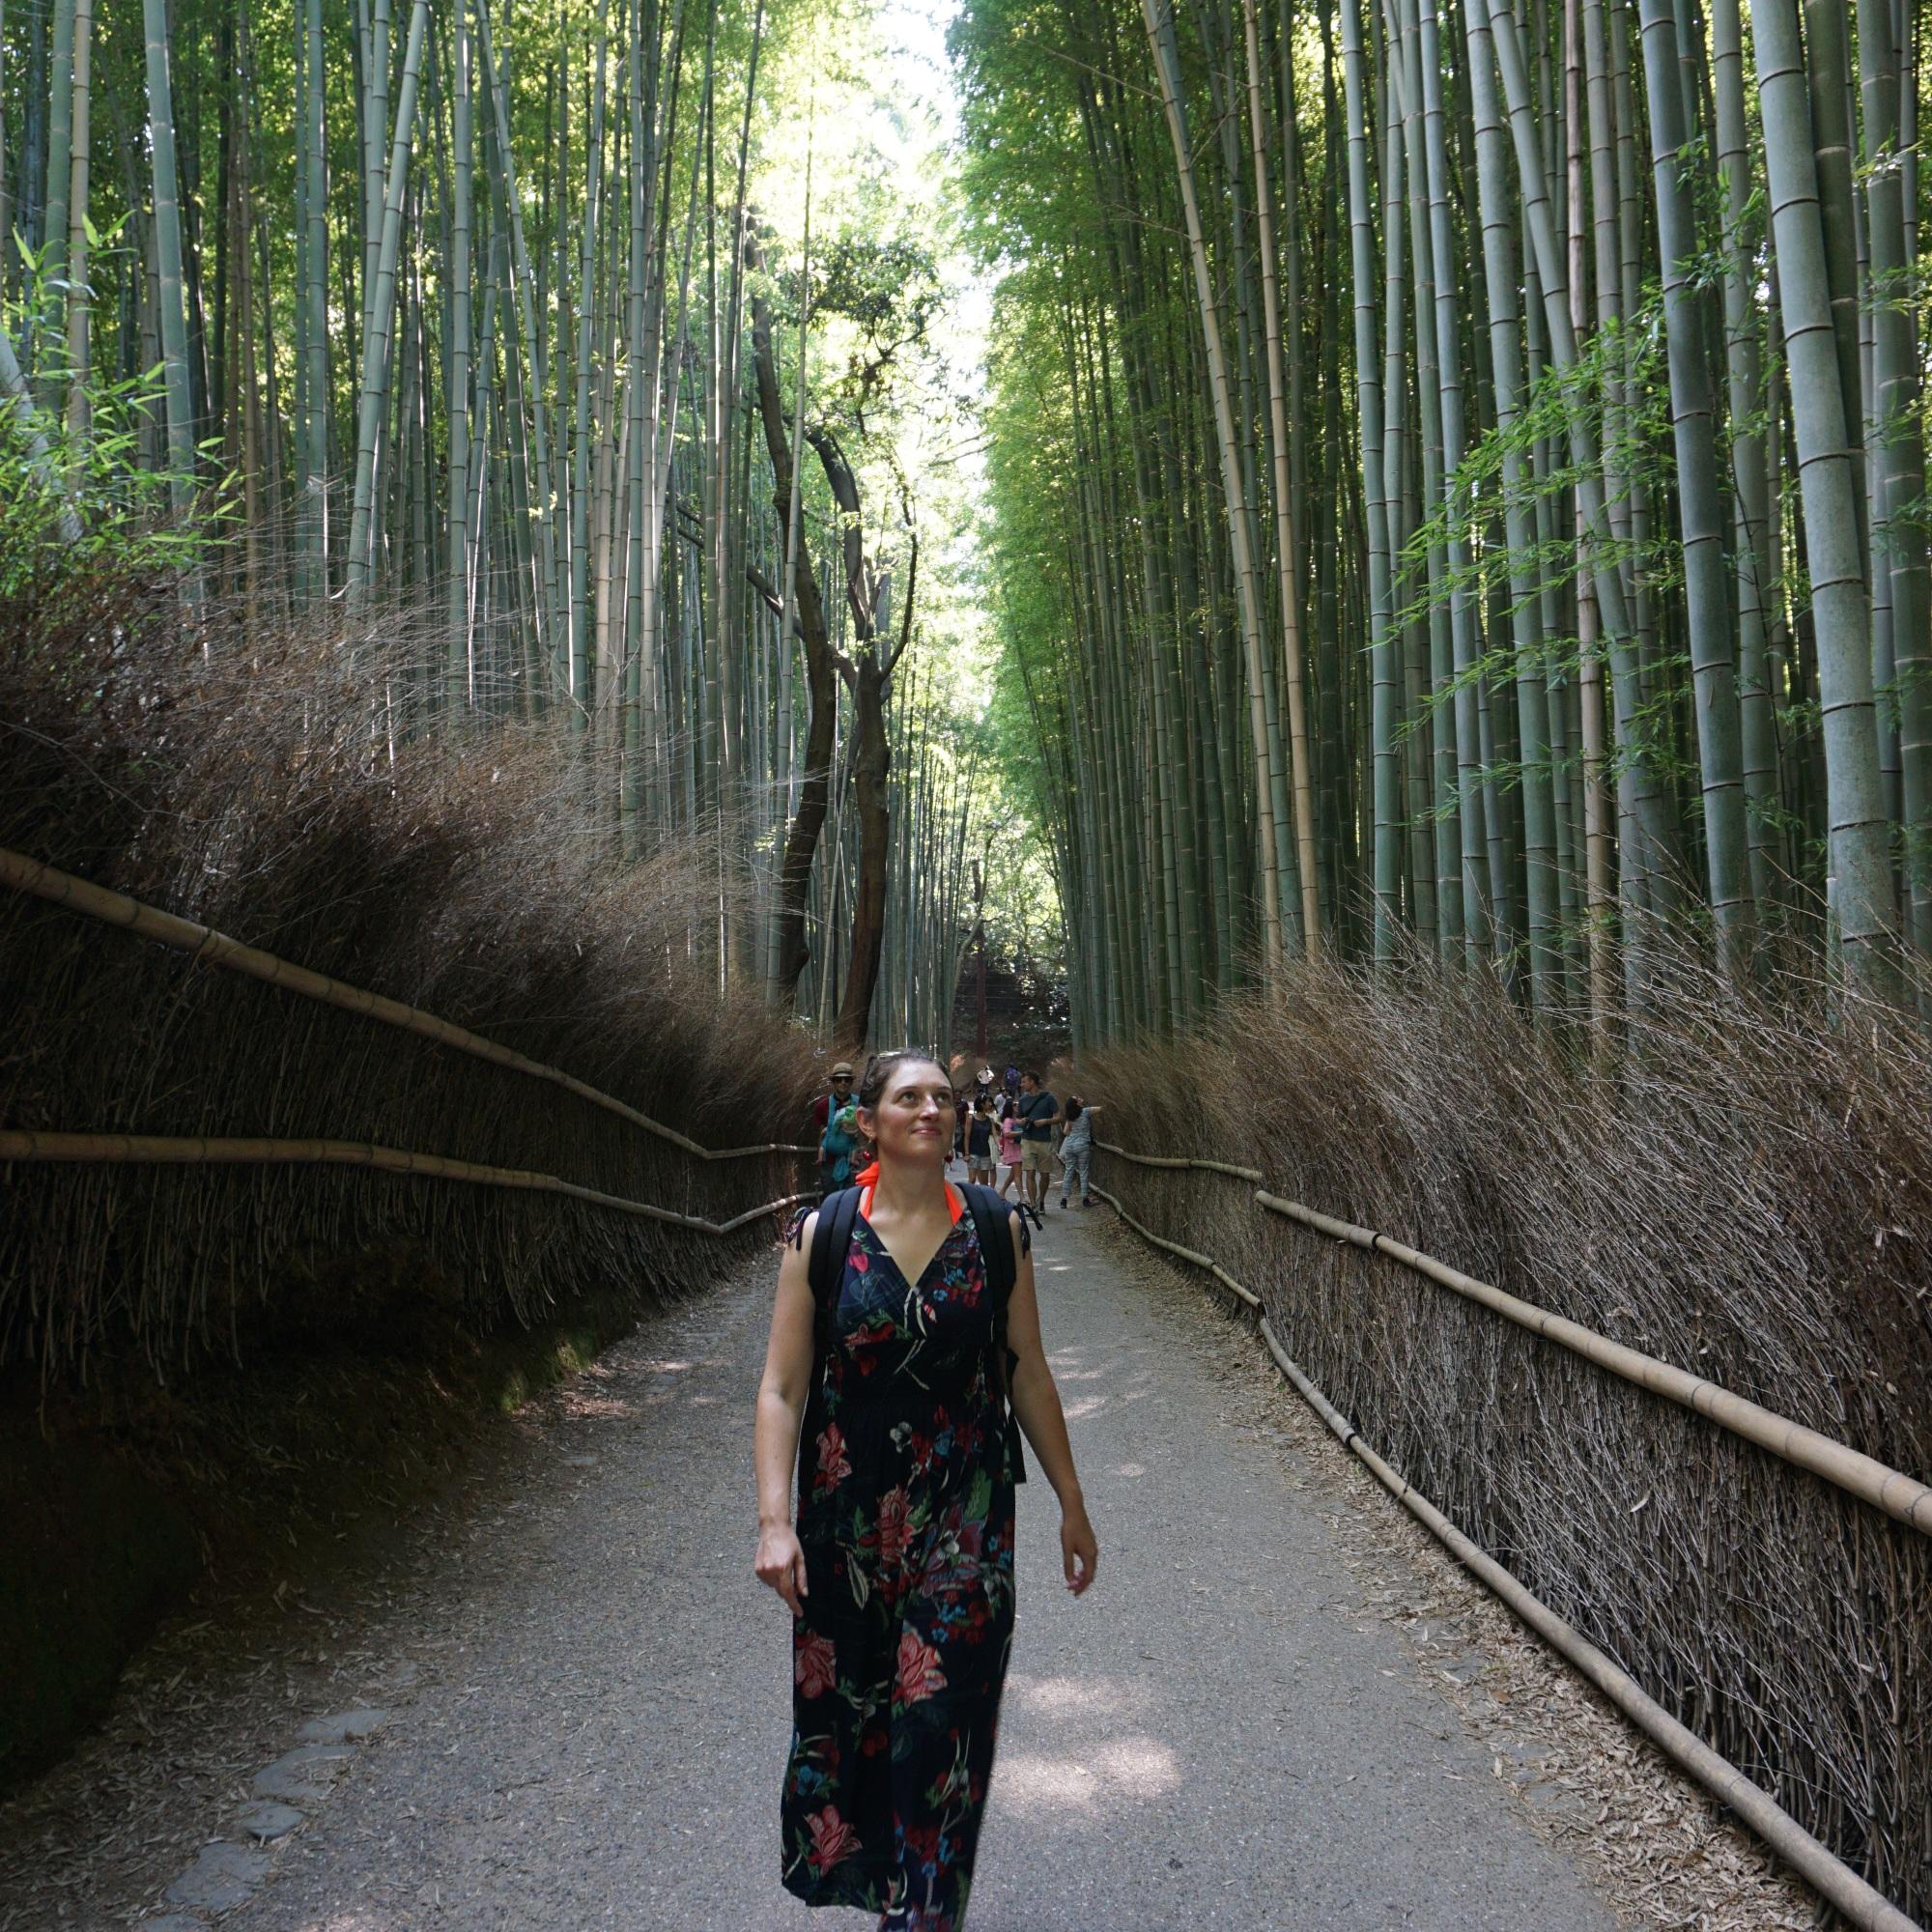 Forêt de bambous, Arashiyama @pink.turtle.blog